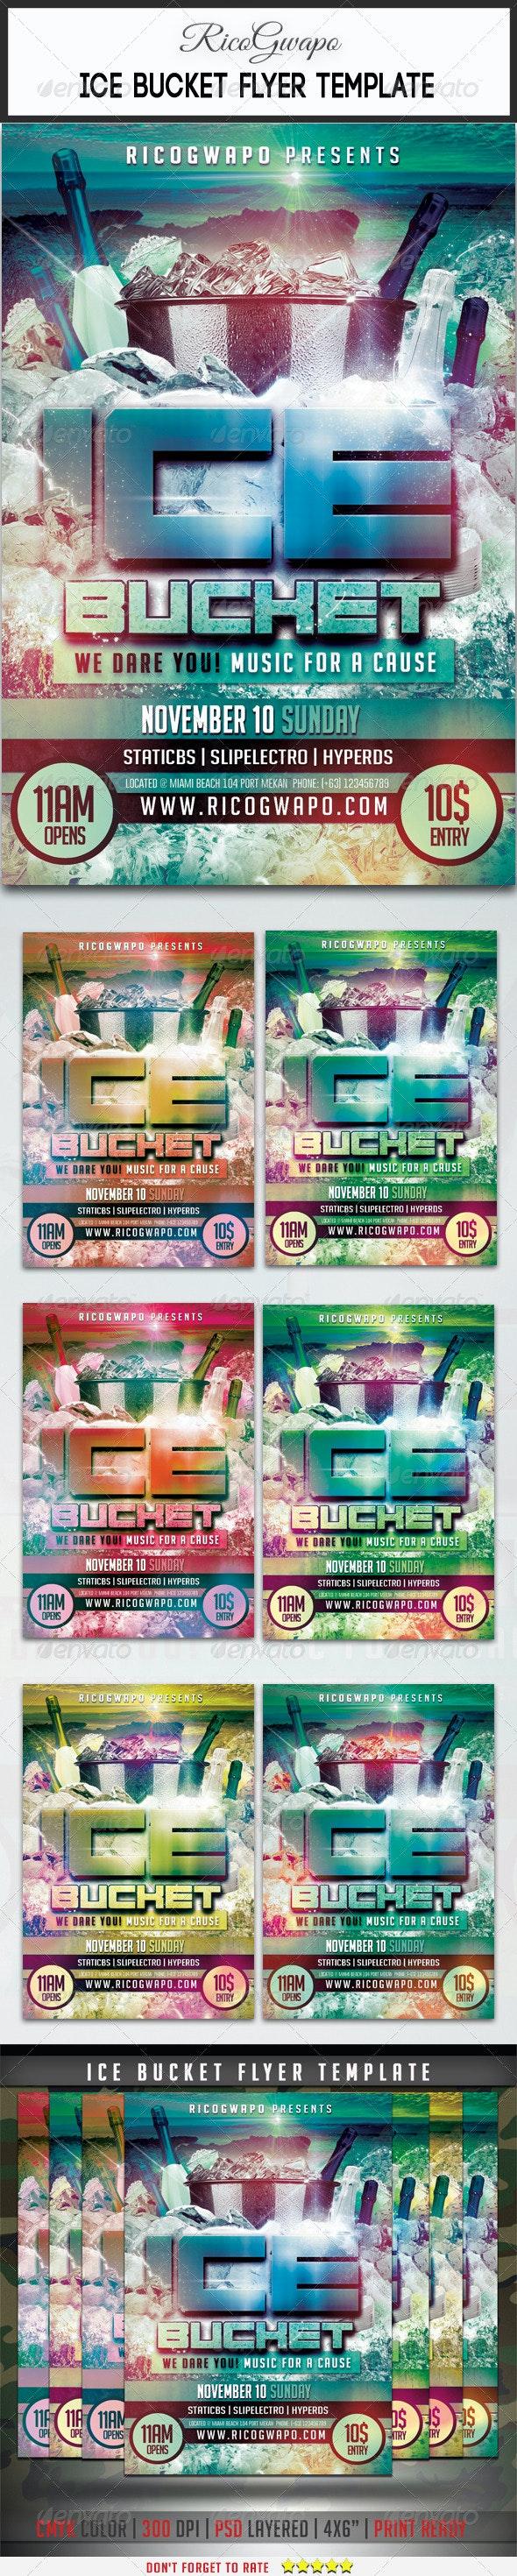 Ice Bucket Flyer Template - Flyers Print Templates